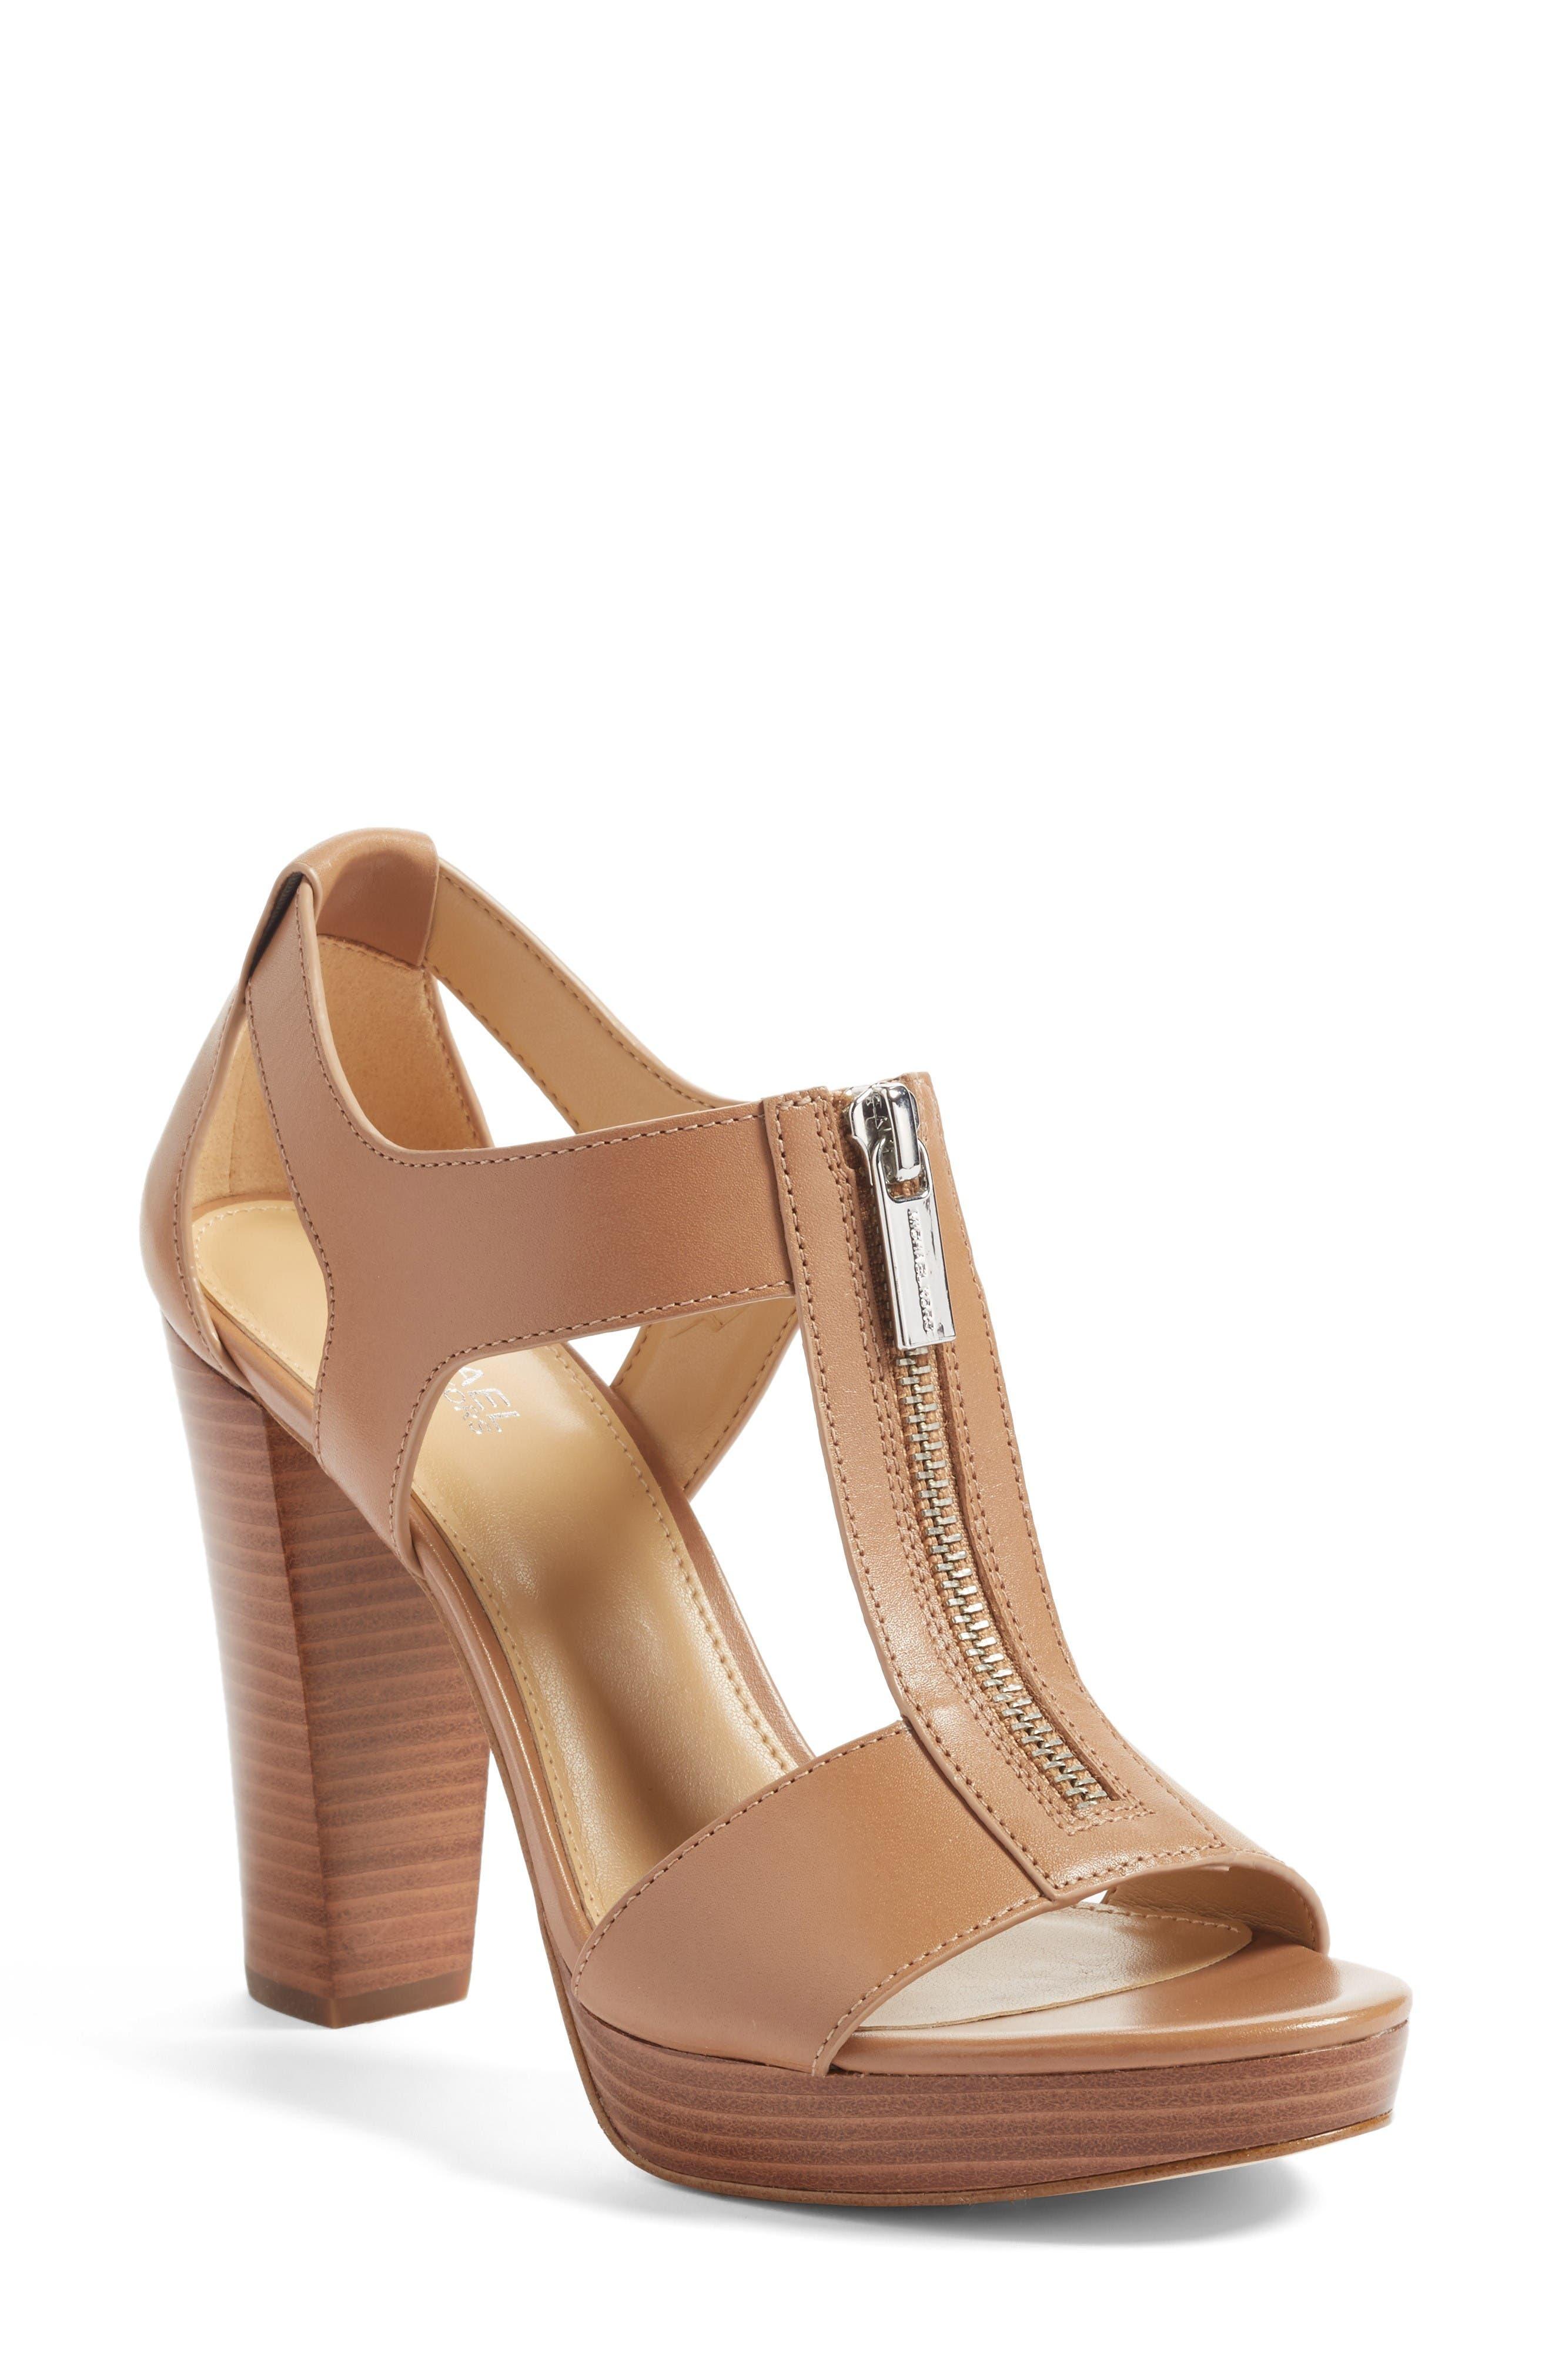 Main Image - MICHAEL Michael Kors 'Berkley' T-Strap Sandal (Women)